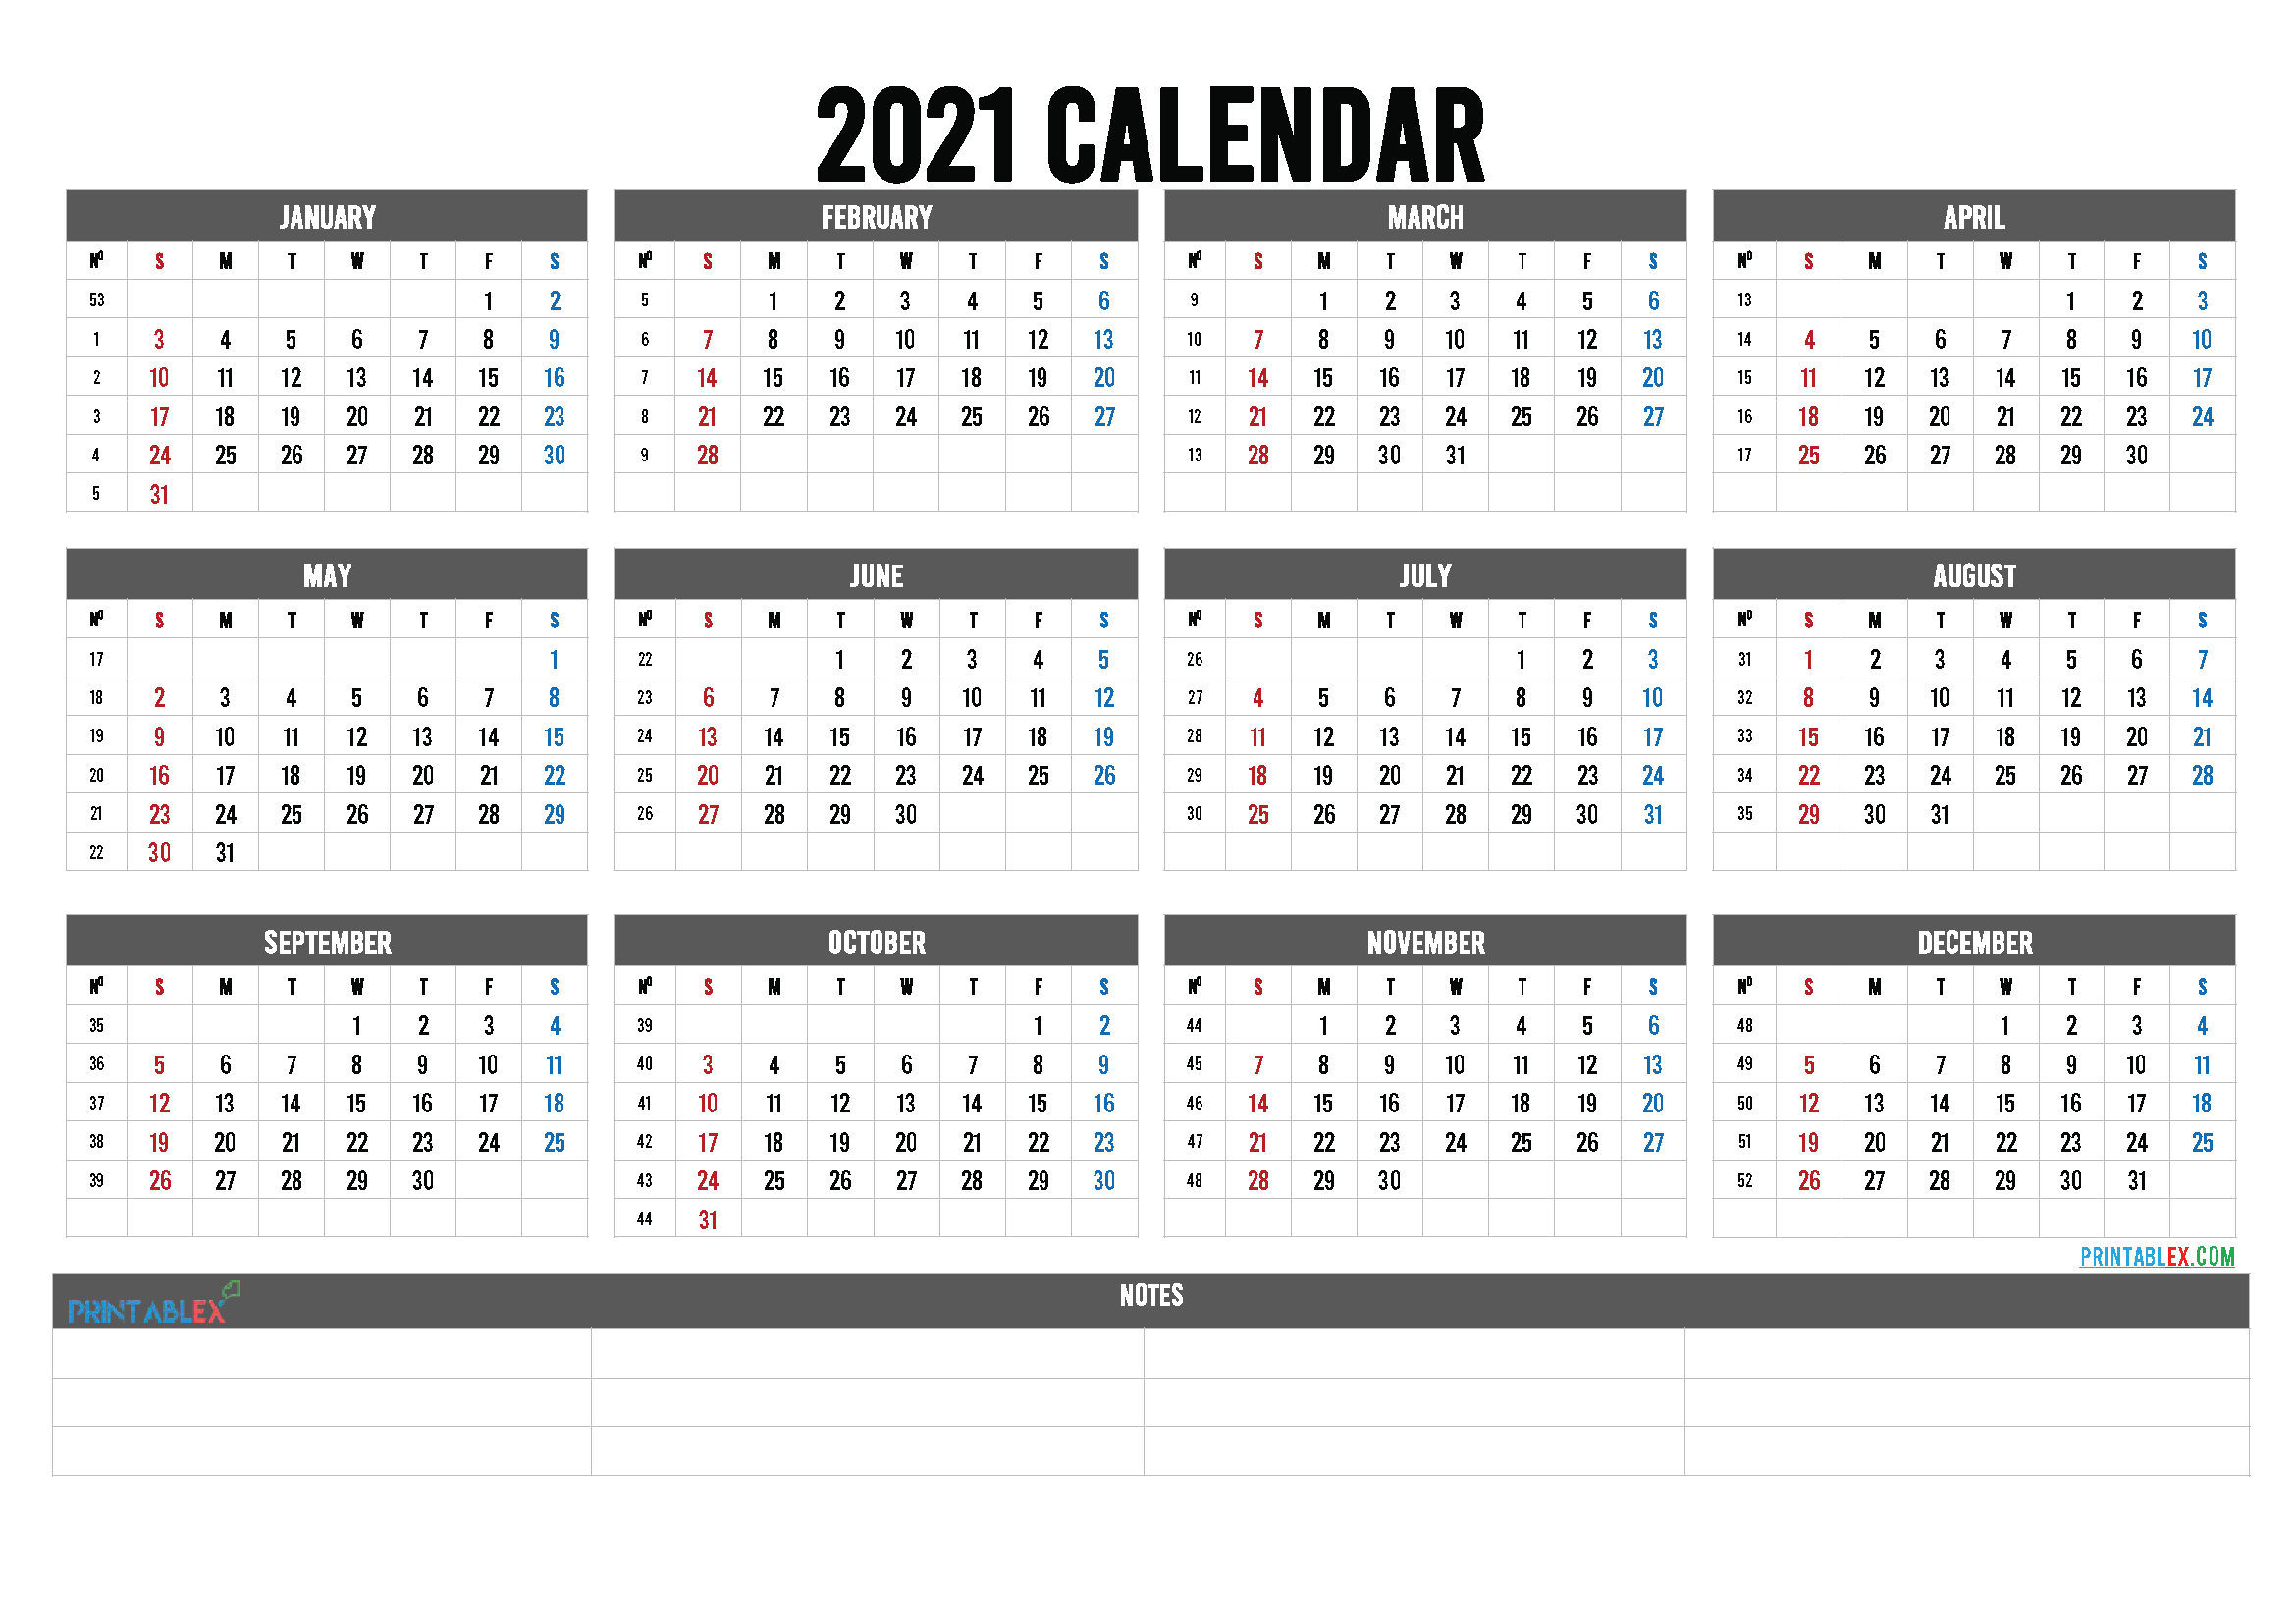 20+ Calendar 2021 With Week Numbers - Free Download Printable Calendar Templates ️